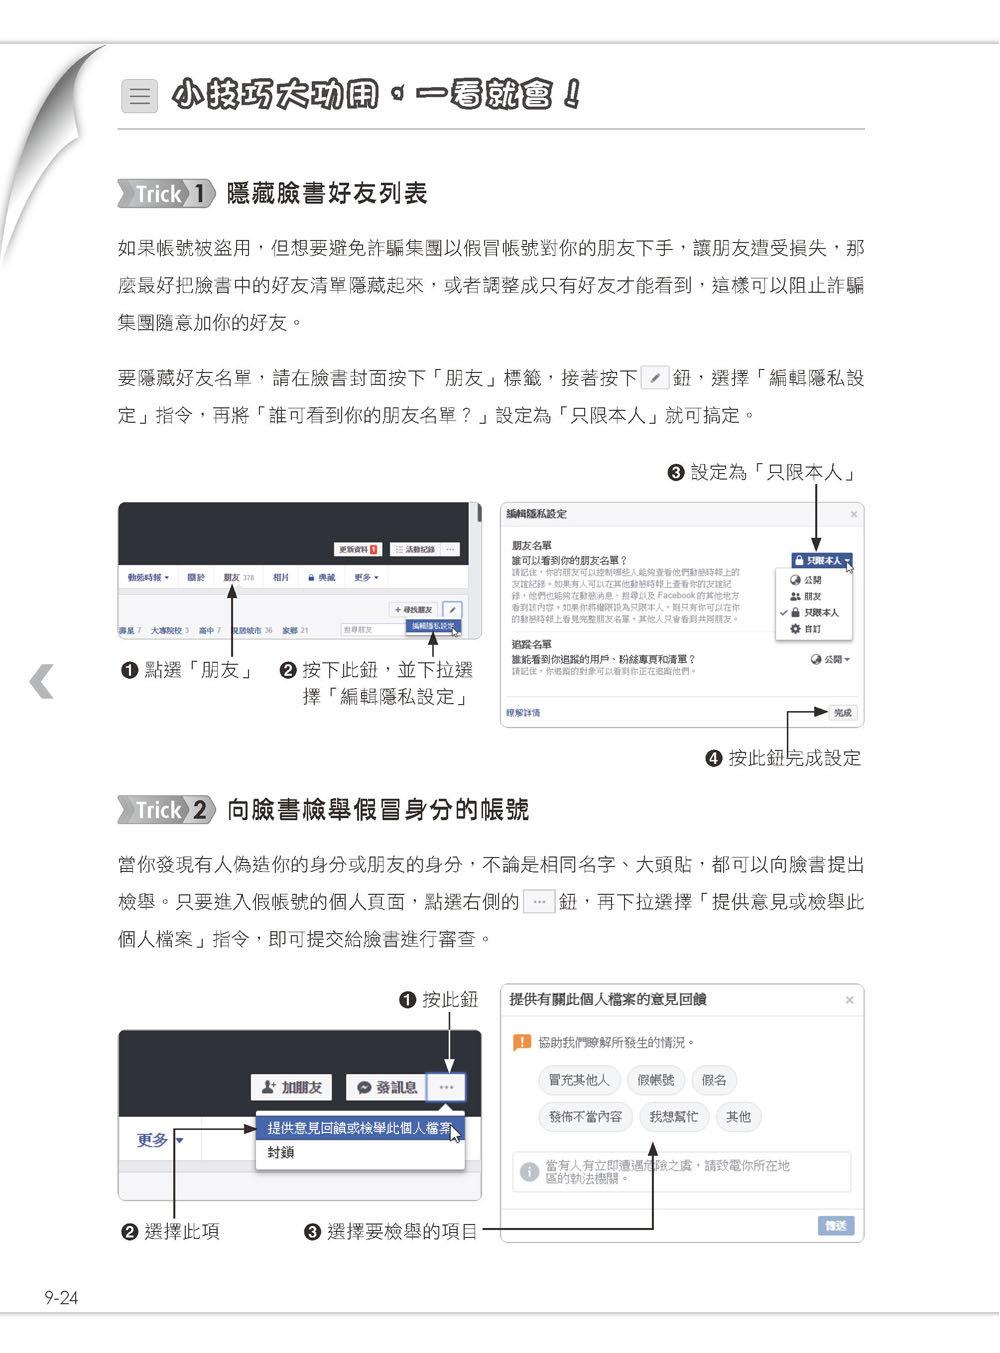 Facebook 互動行銷:社群口碑經營新思路+廣告投放如何有成效,想做好臉書行銷,操作心法就在這!-preview-57